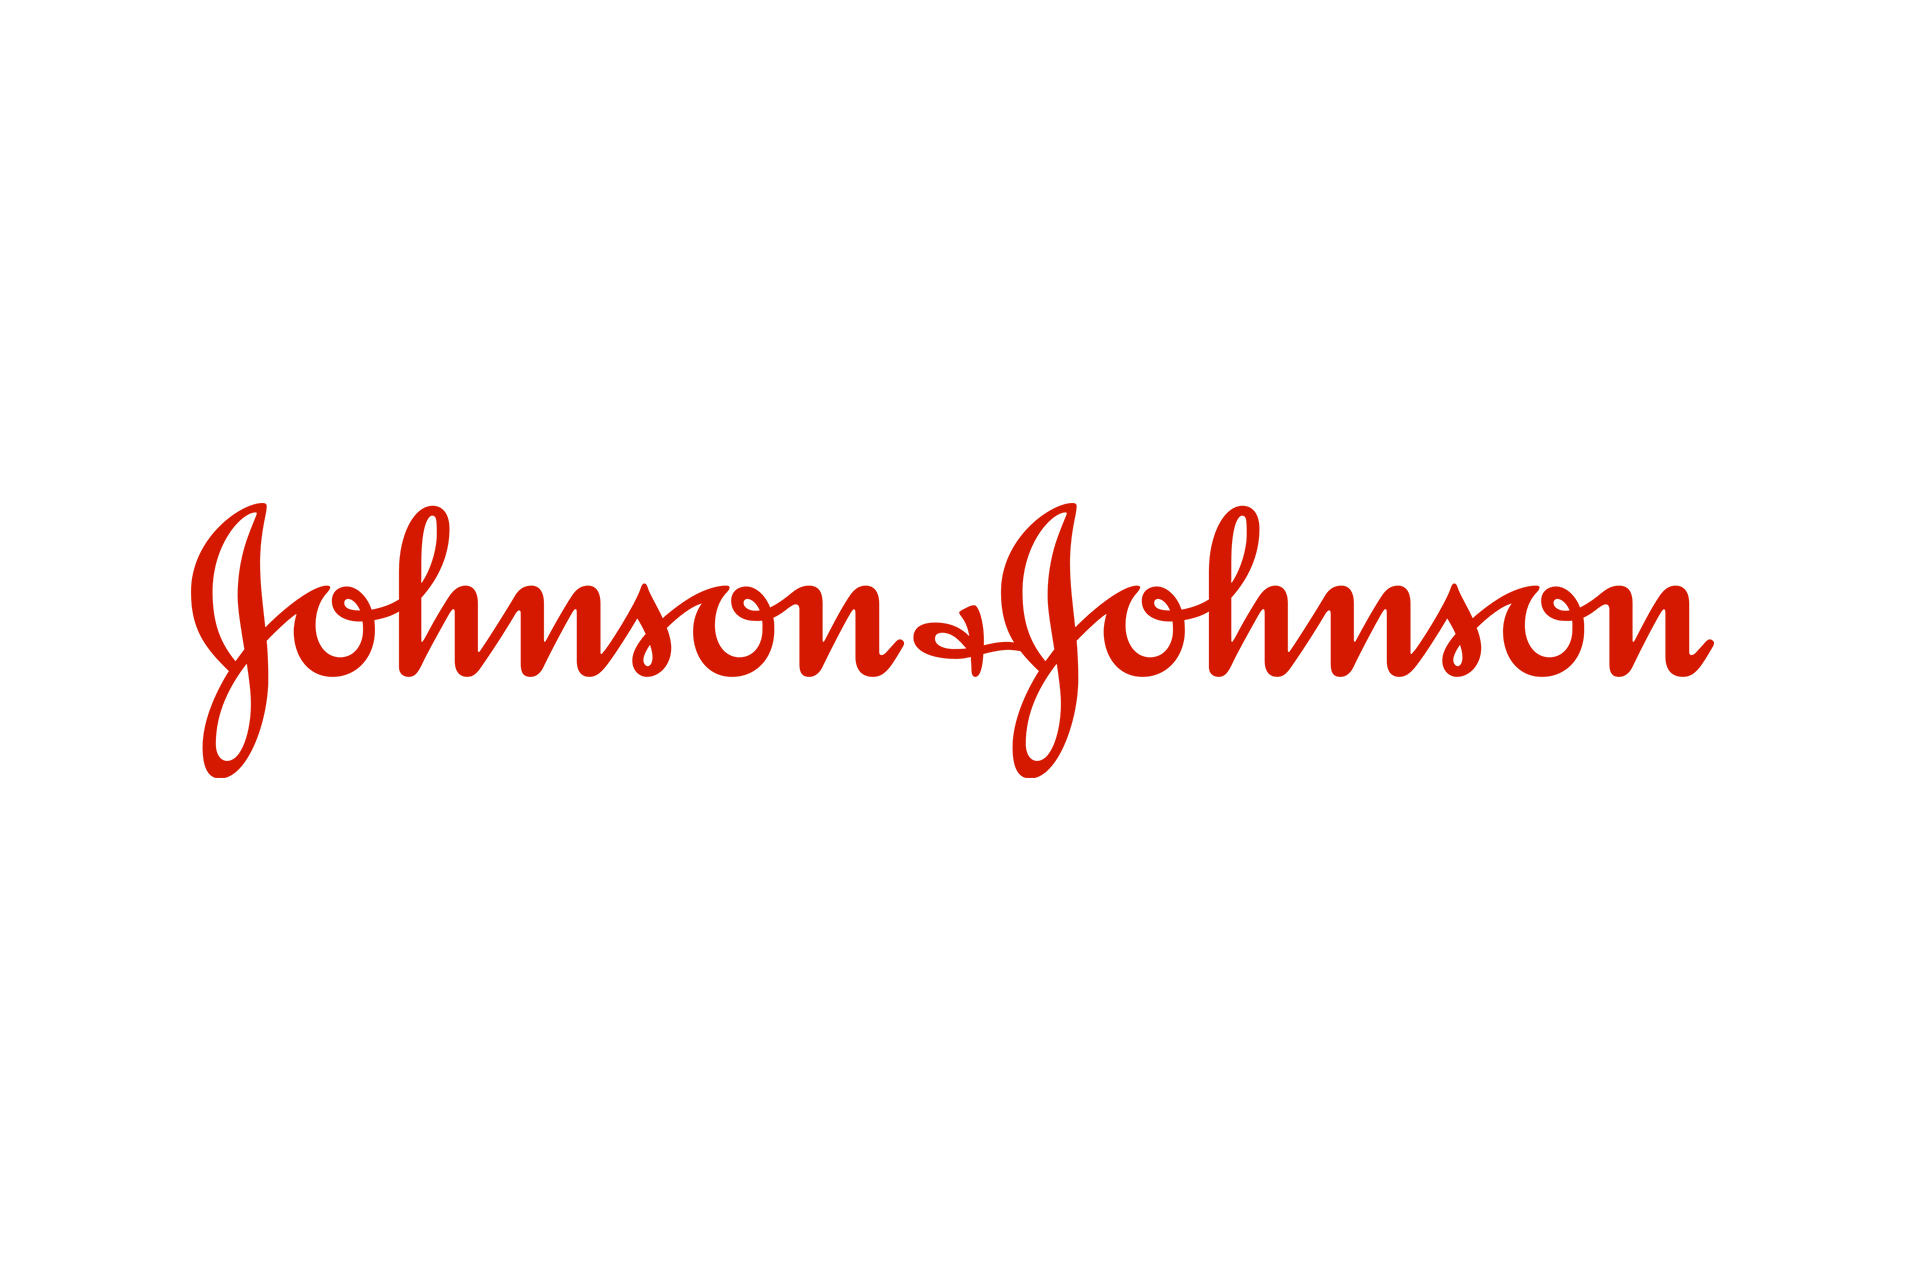 johnson johnson referenz jentner metallveredelung logo farbig